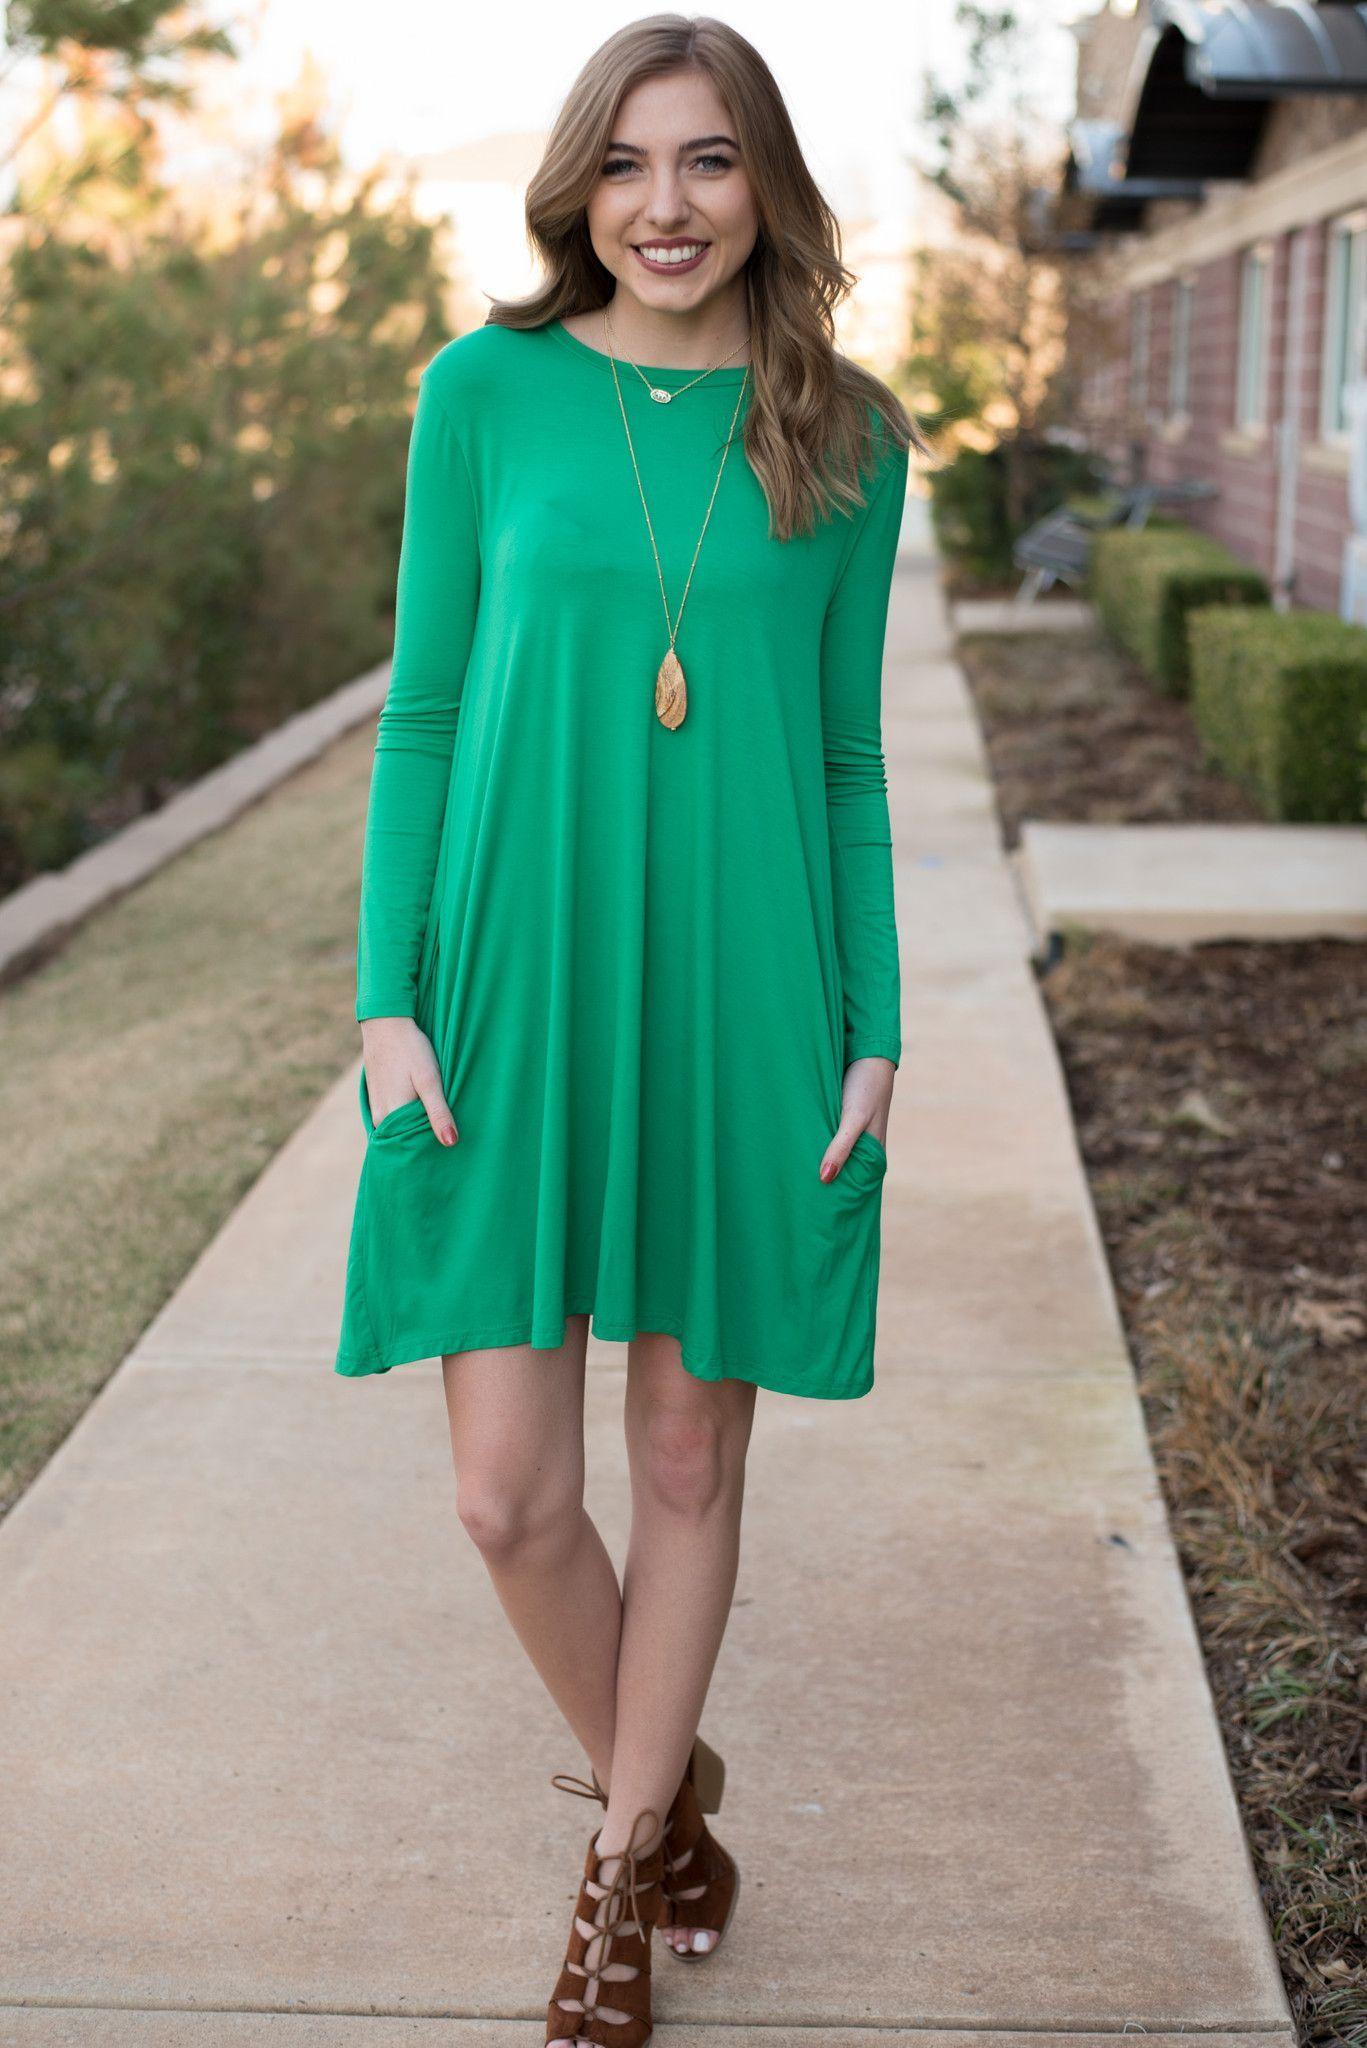 662a8189628db Piko long sleeve swing dress kelly green | My Style | Piko dress ...